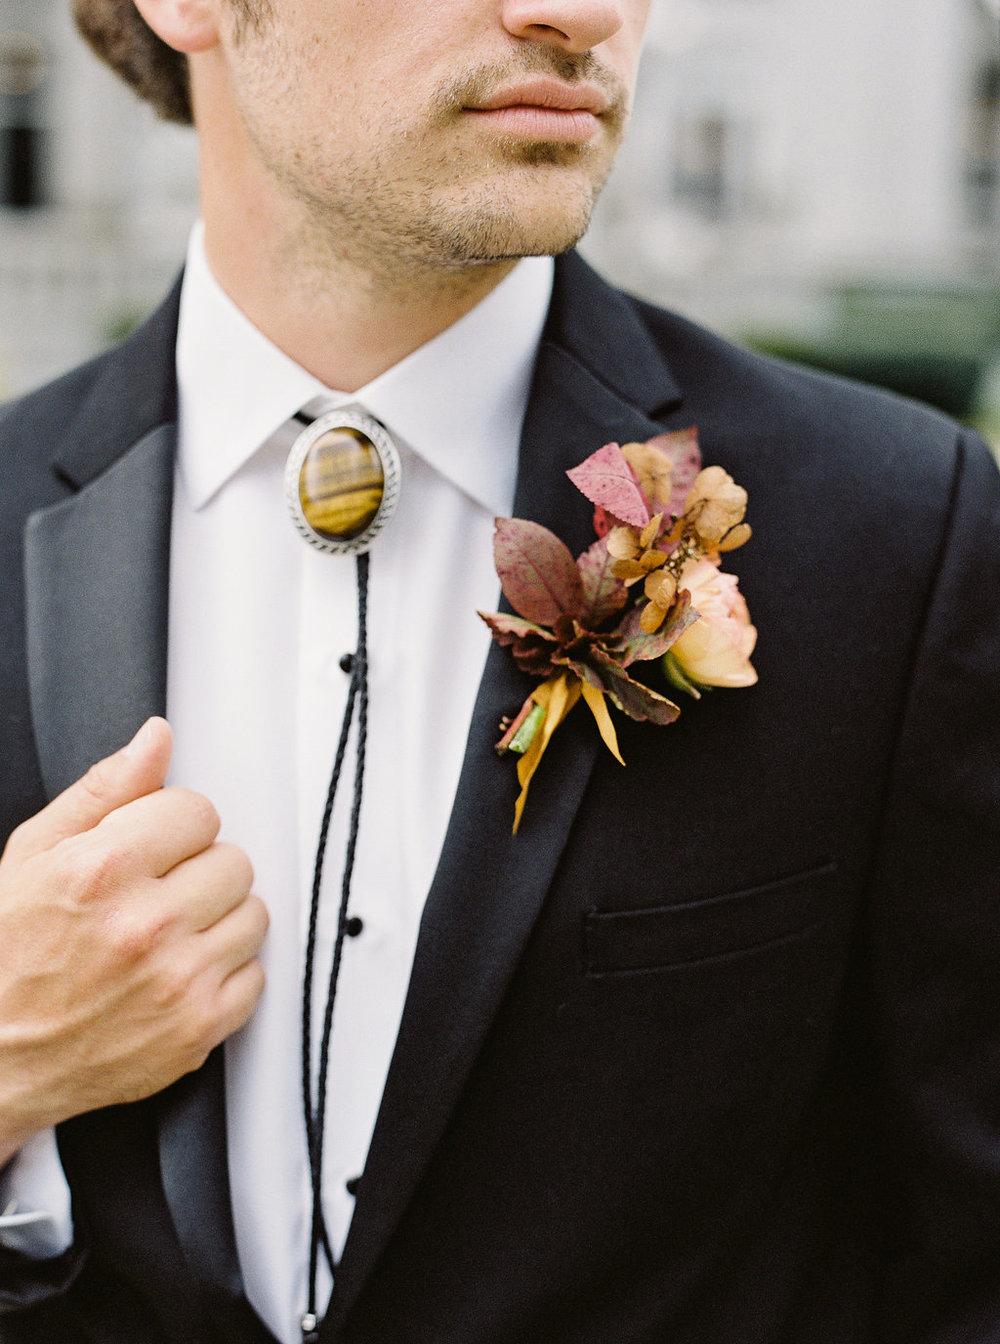 fall-wedding-Jenny-haas-Samantha-joy-events-laurel-court-cincinnati-wedding-groom